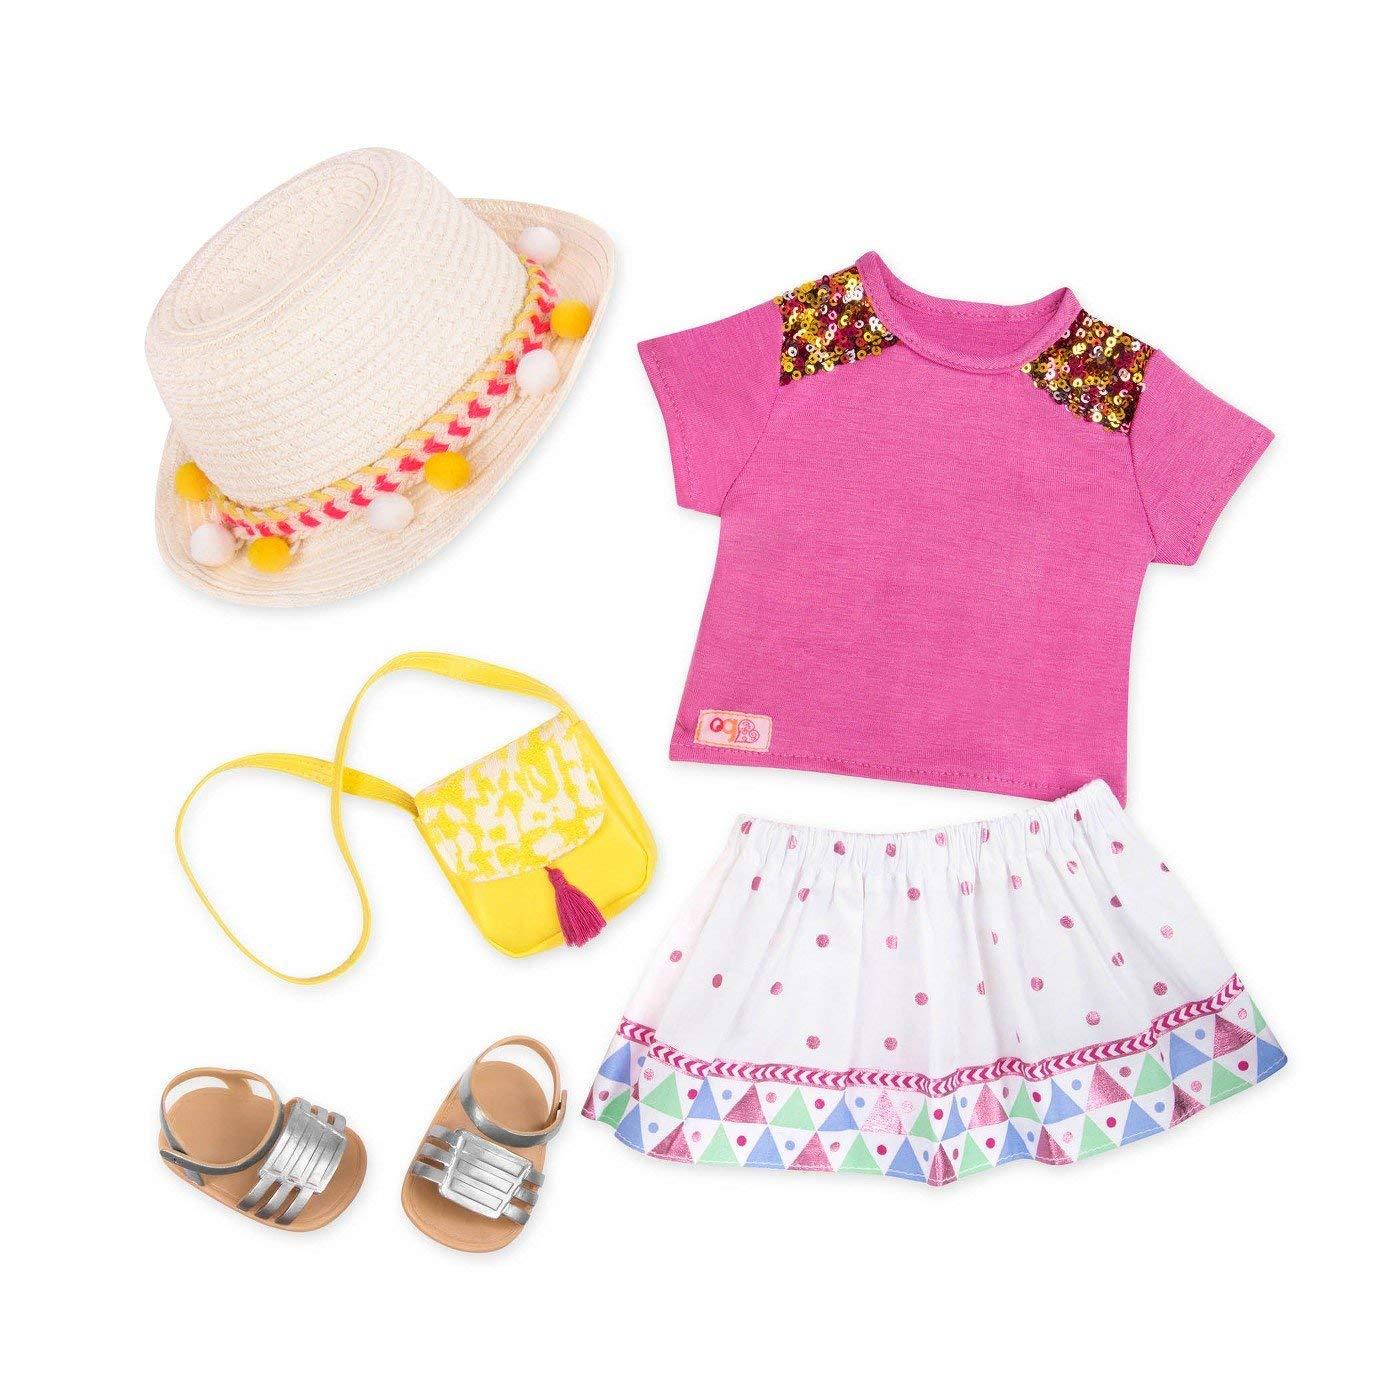 Our Generation Набор одежды для кукол  Deluxe для отпуска